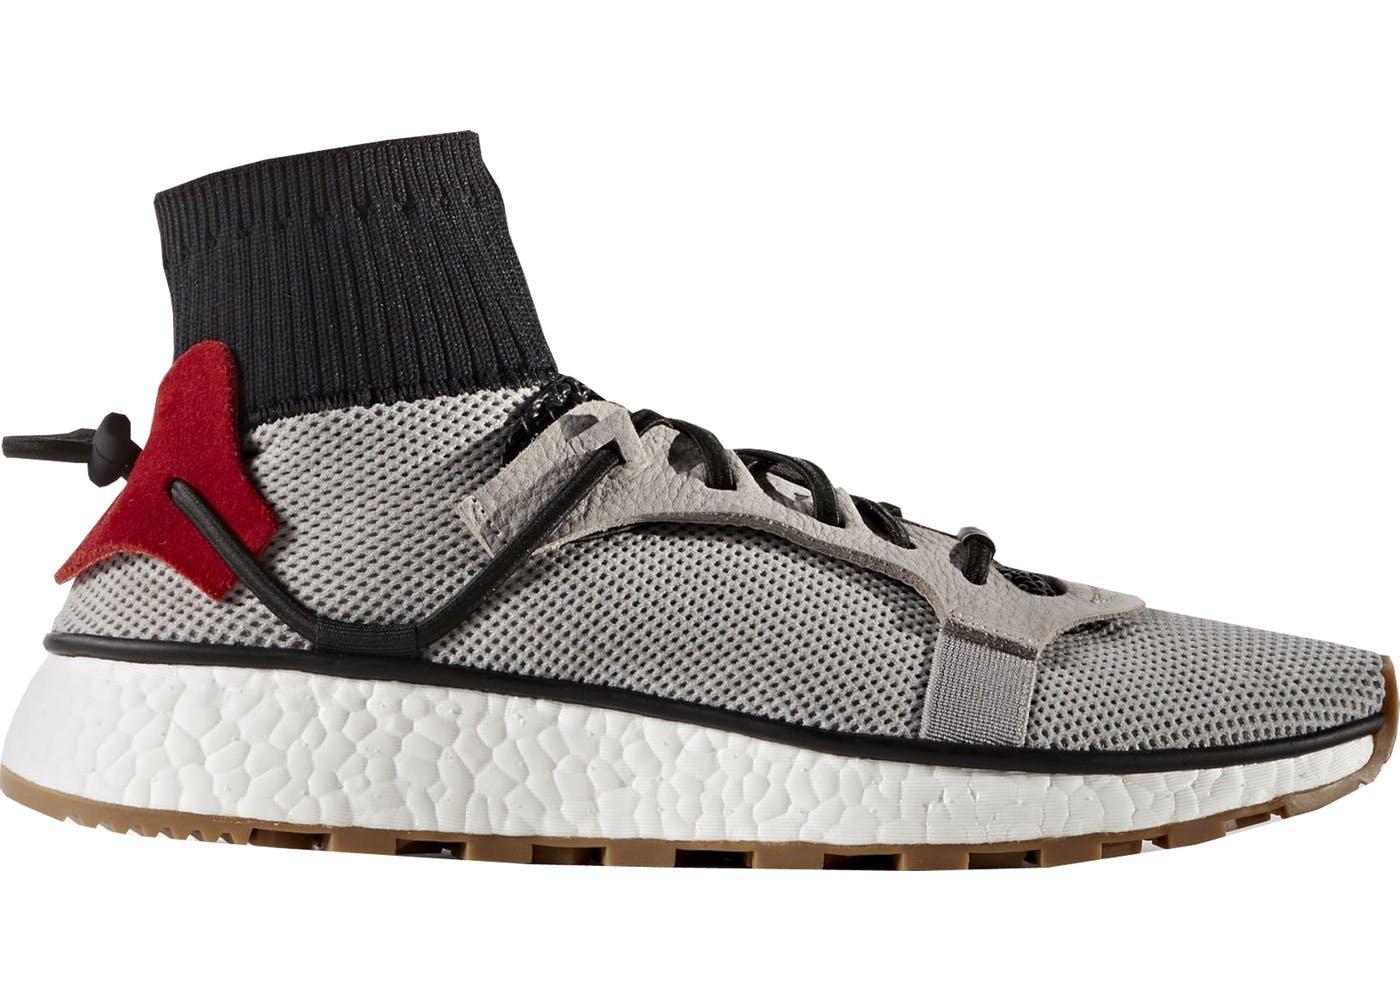 reputable site abff8 cc1e2 adidas Originals x Alexander Wang AW Run - US 11.5